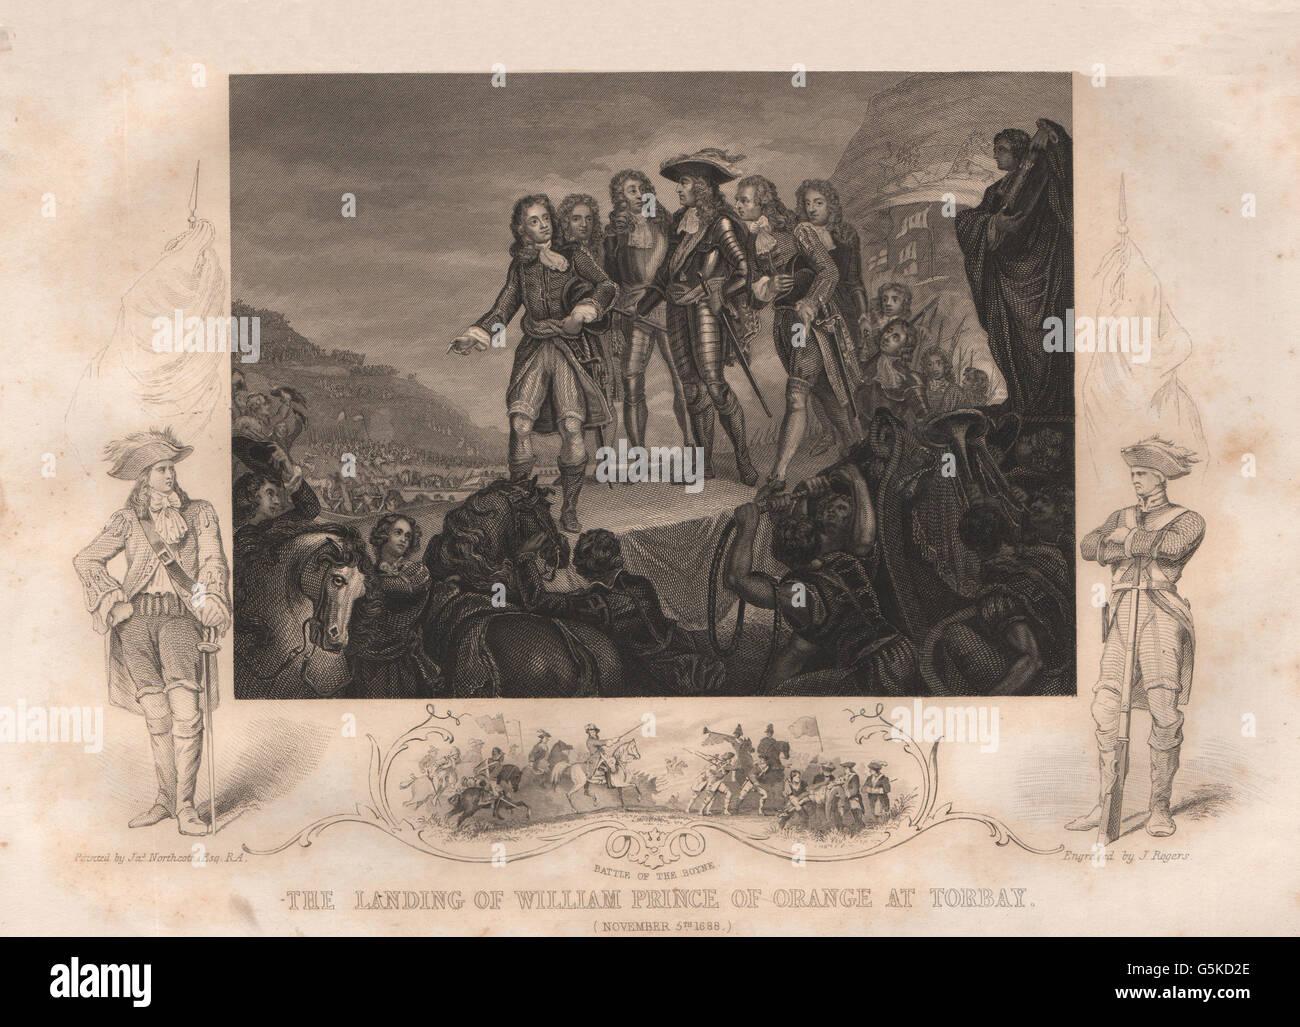 GLORIOUS REVOLUTION: William Prince Of Orange landing at Torbay 1688. Boyne 1853 - Stock Image